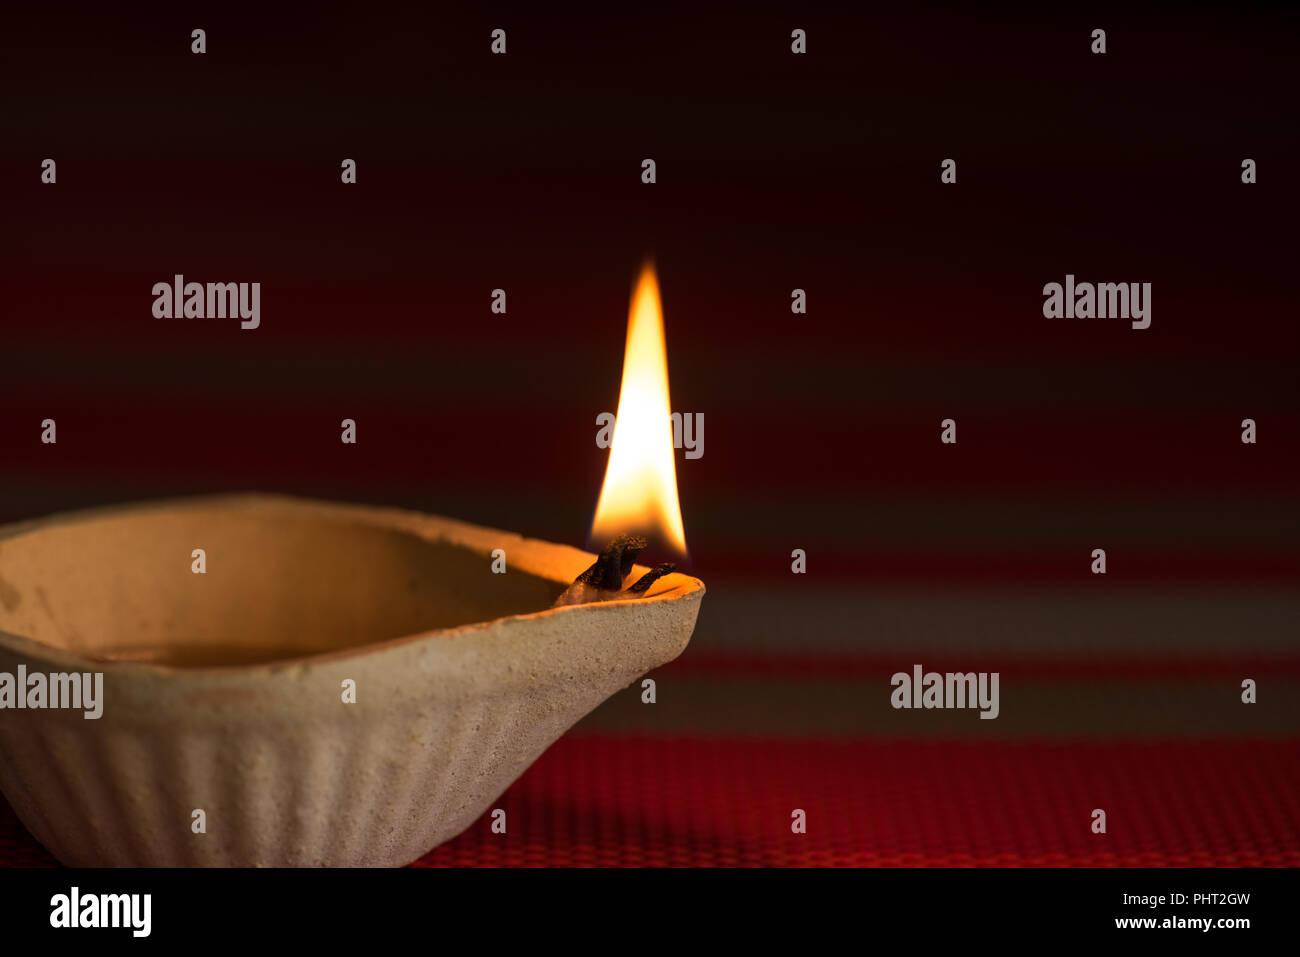 diwali lanterns, diwali to learn words, diwali graphics, diwali festival, diwali greetings, diwali pooja, diwali decoration ideas, diwali clip art, diwali gods, diwali goddess coloring page, diwali rangoli, diwali animated, diwali celebrations in trinidad and tobago, diwali lakshmi, diwali fireworks, diwali diva, diwali in dipa, diwali celebration india, diwali lights, diwali aarti thali decoration, on diya lamps of diwali